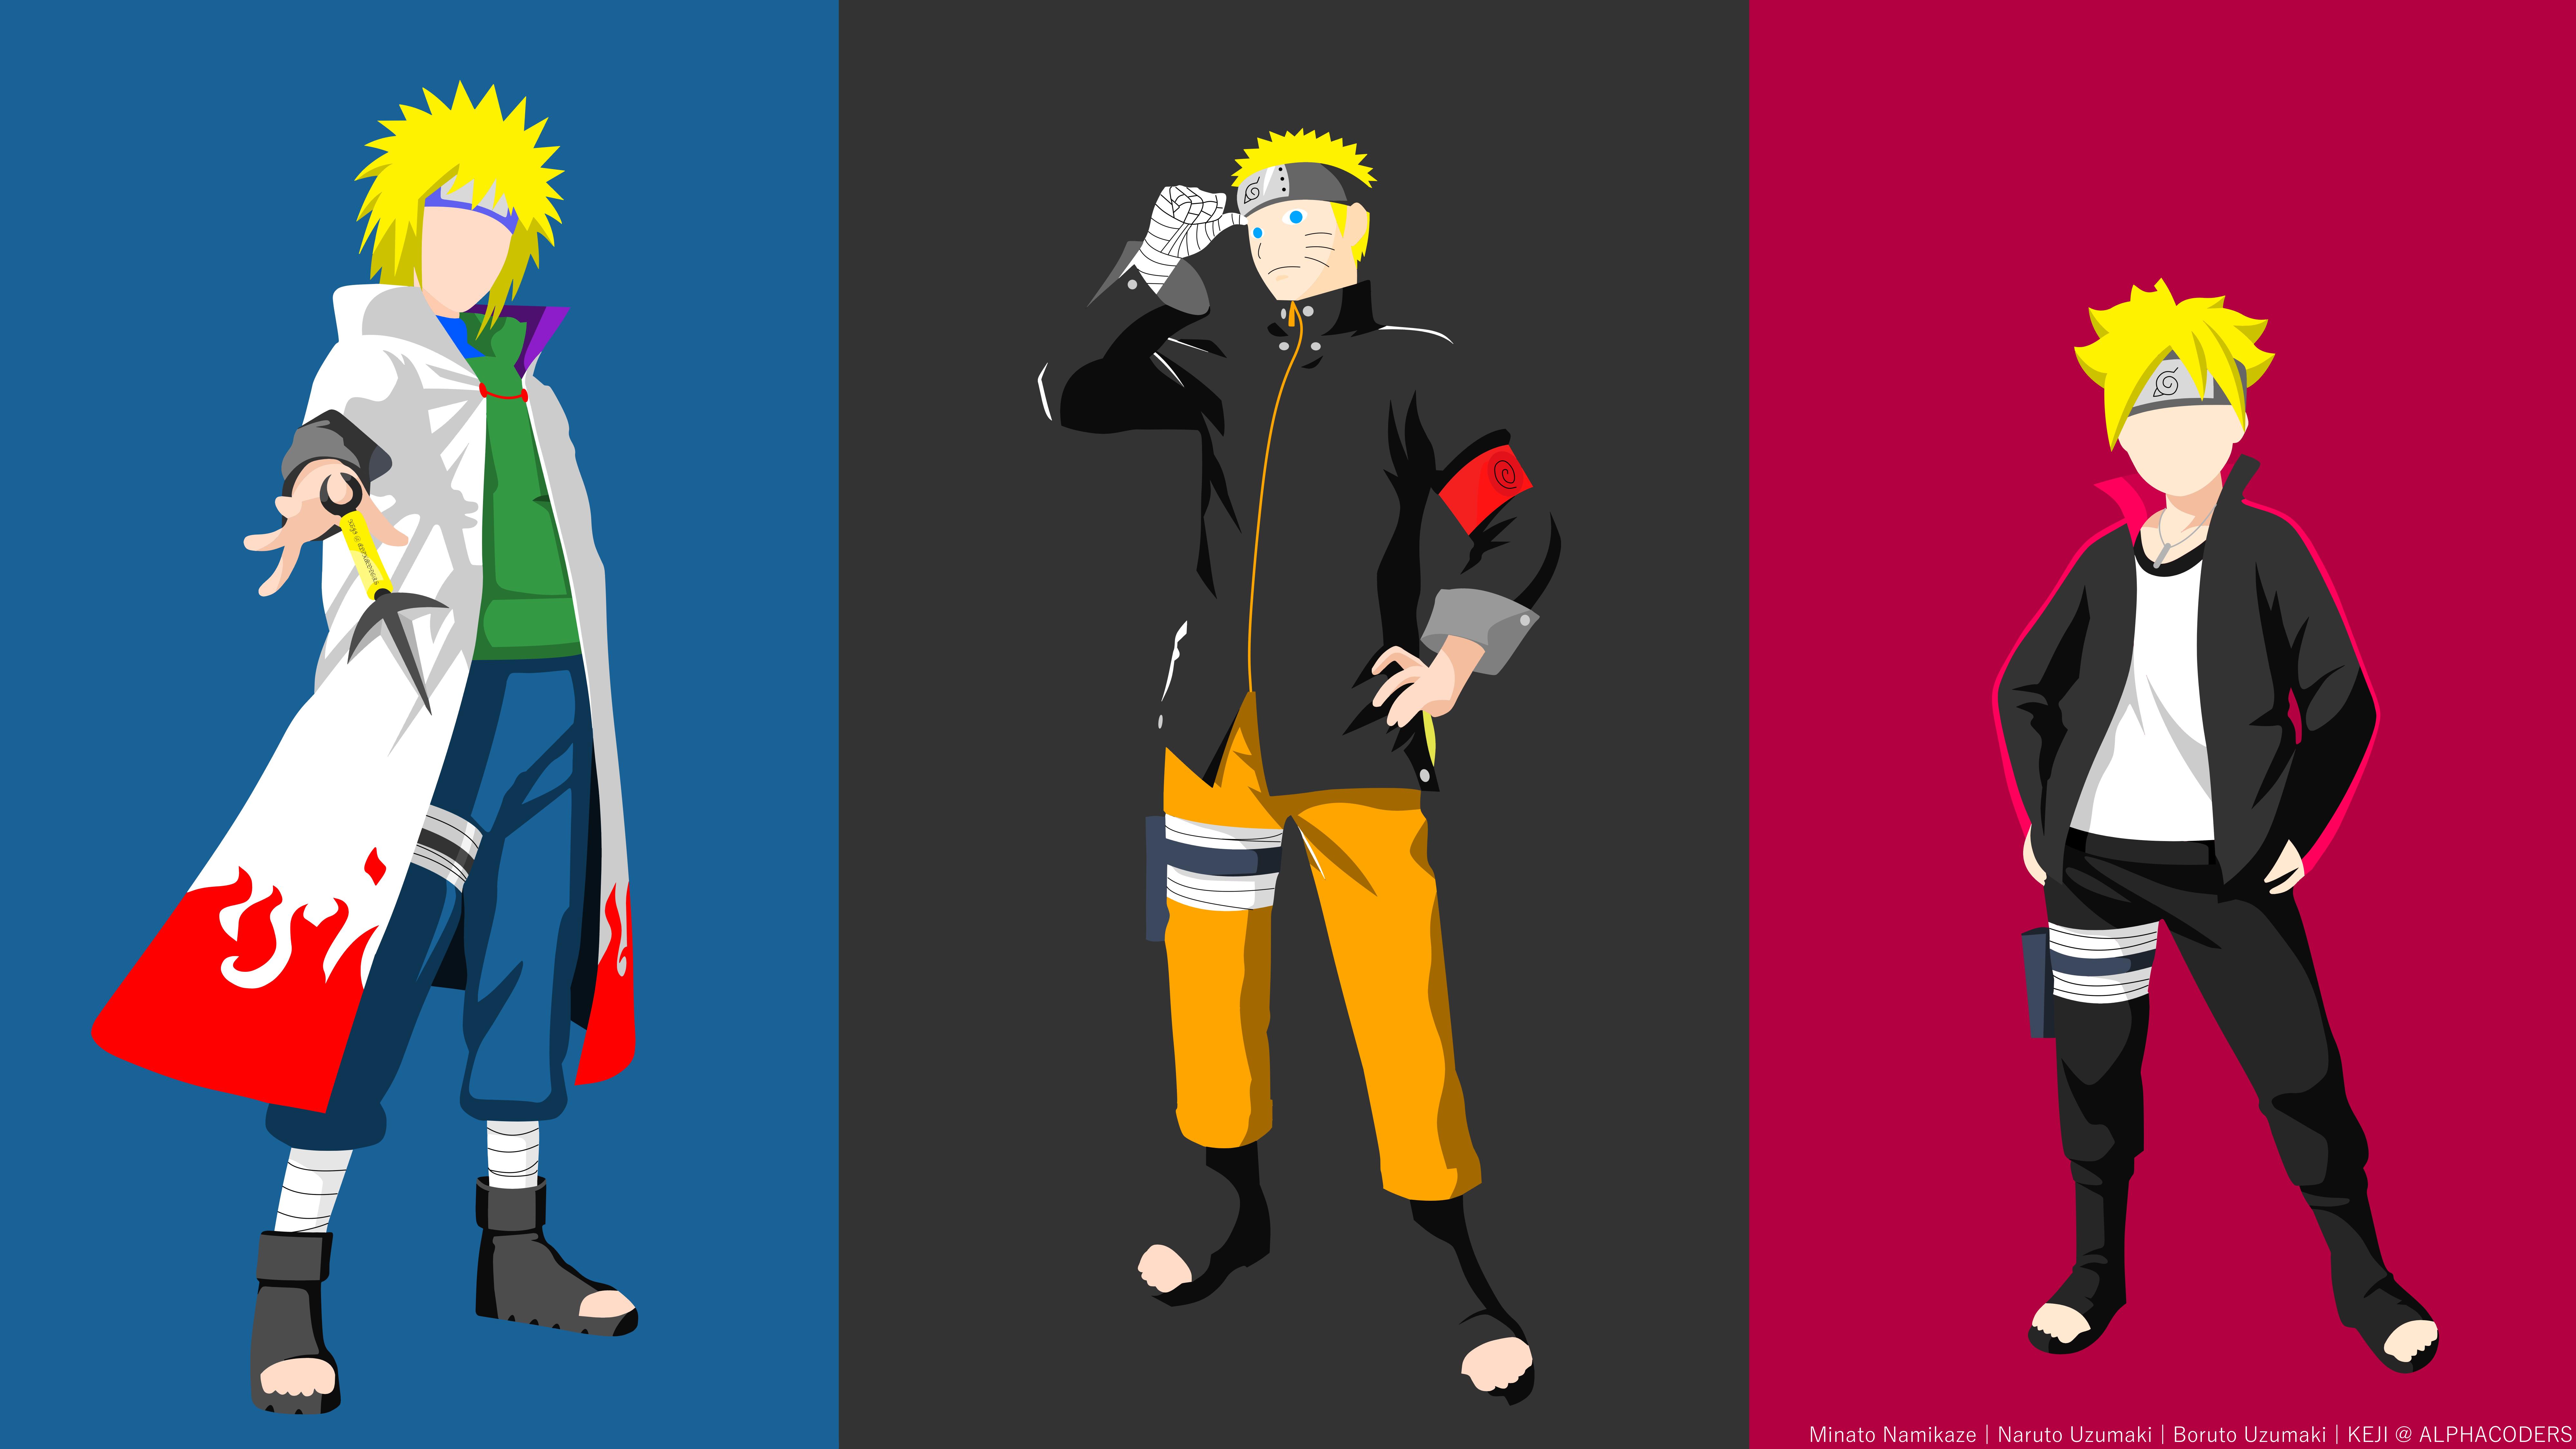 Blonde Boruto Uzumaki Boruto Naruto Next Generations Boy Minato Namikaze Minimalist Naruto Naruto Uz 8000x4500